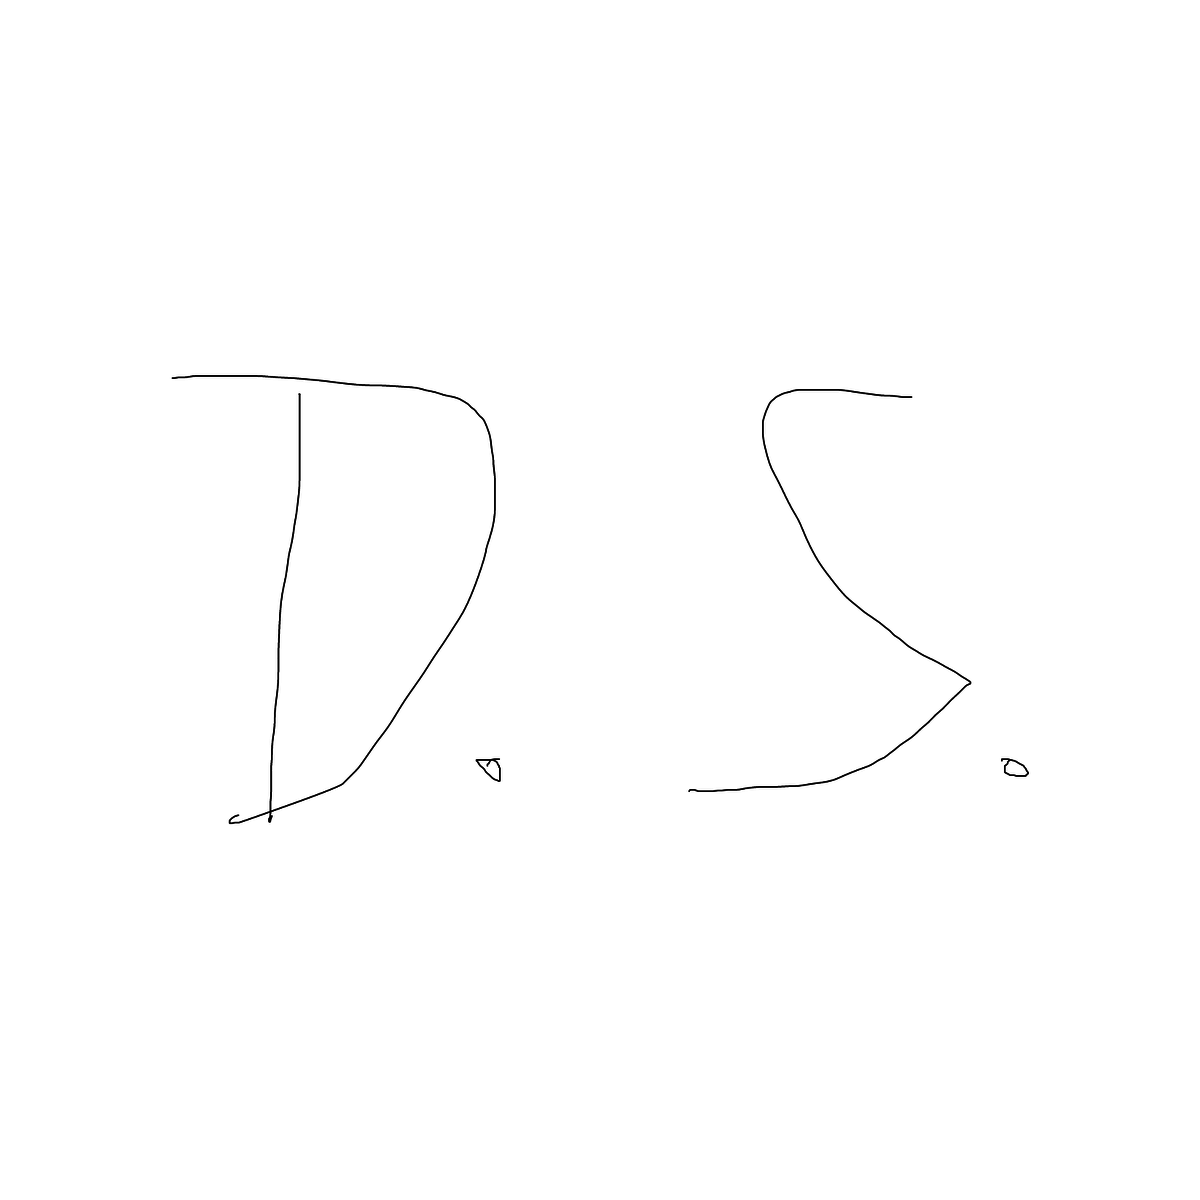 BAAAM drawing#4822 lat:50.1762542724609400lng: 8.7220163345336910